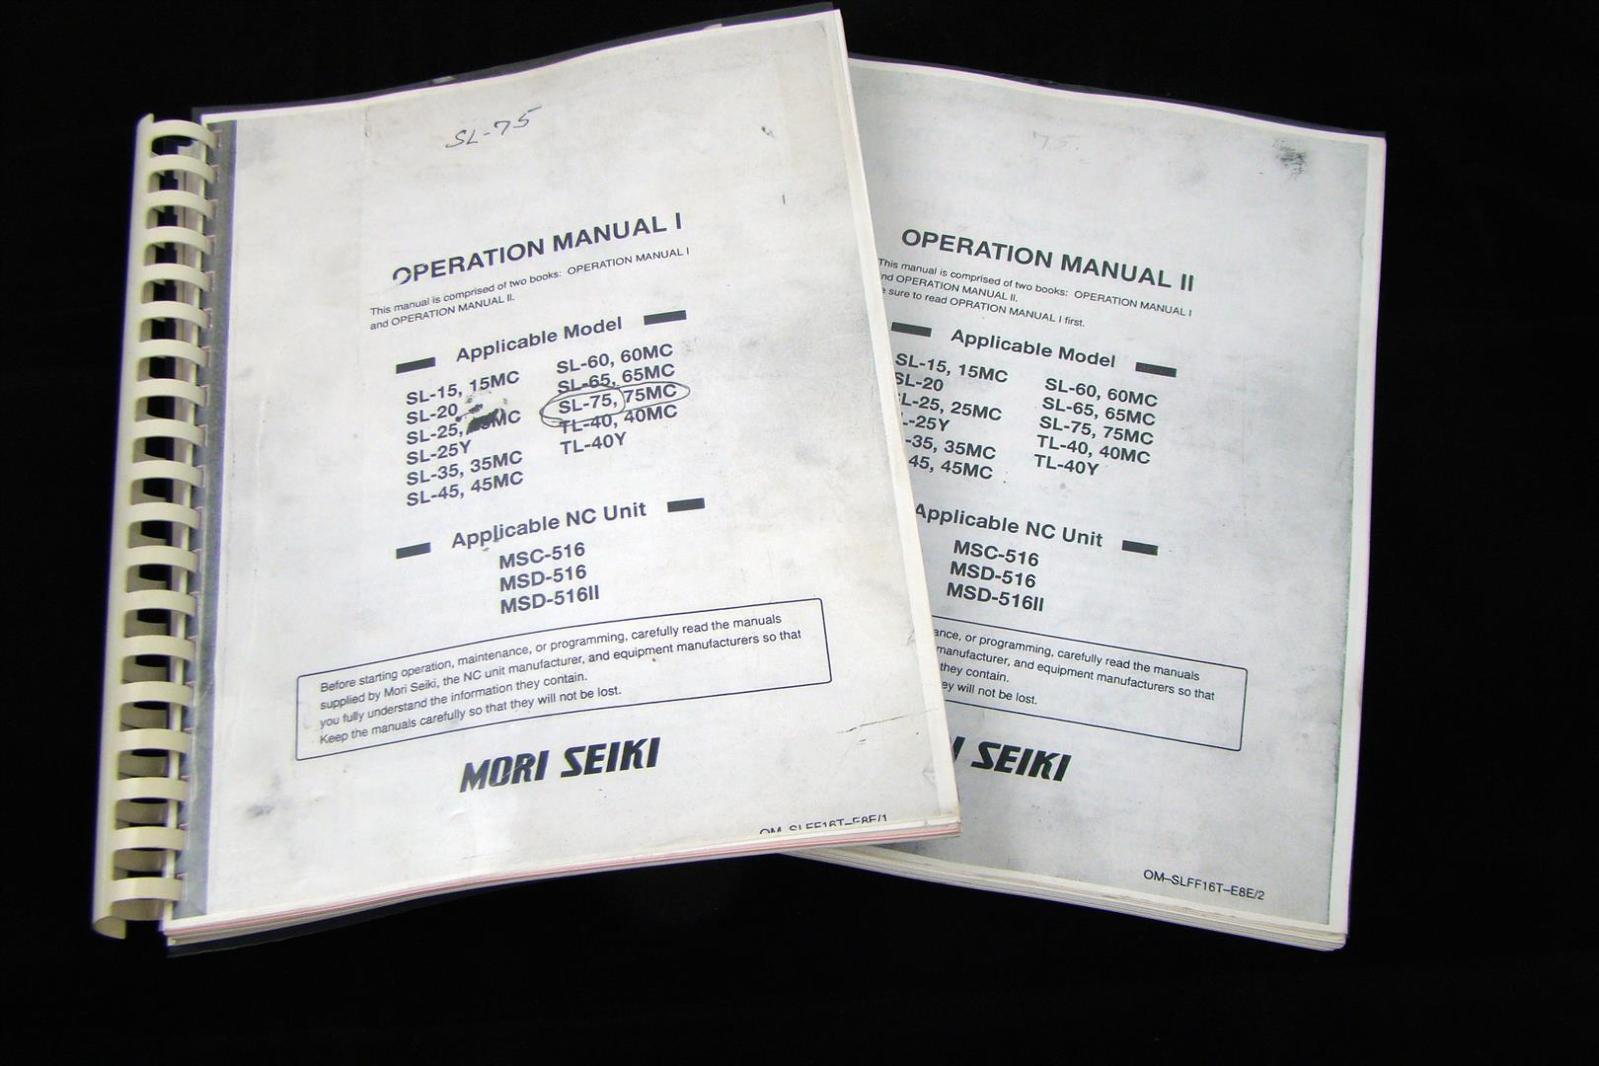 mori seiki manual de operaci n i ebay rh ebay com Mori-Seiki Forums Mori-Seiki Turret Manuals